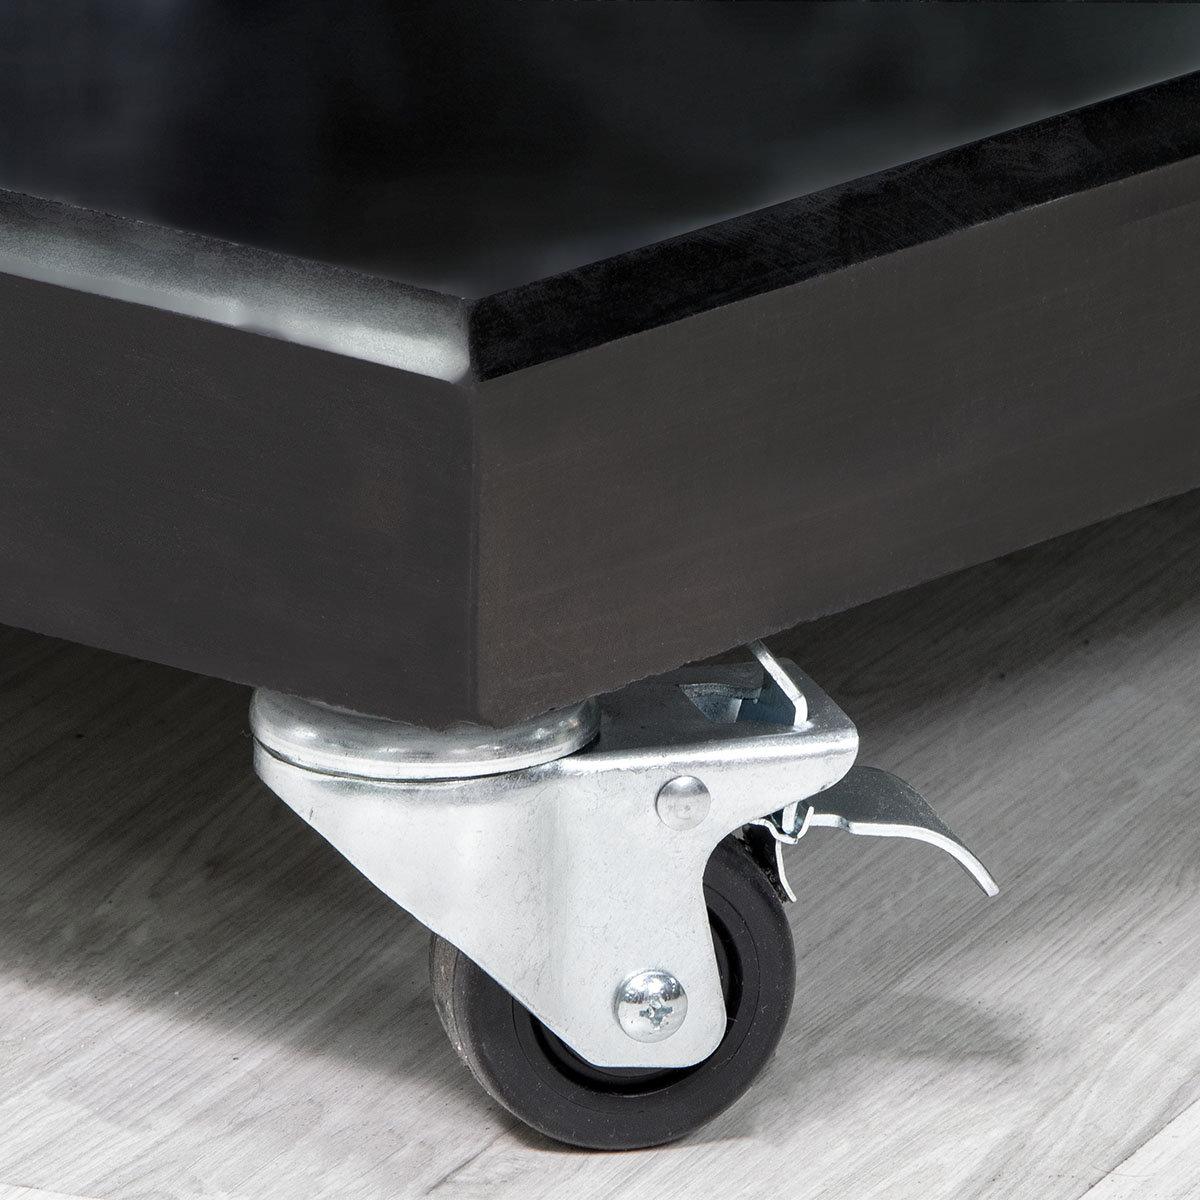 Granit-Schirmständer mit Lenkrollen, ca 120 kg | #2